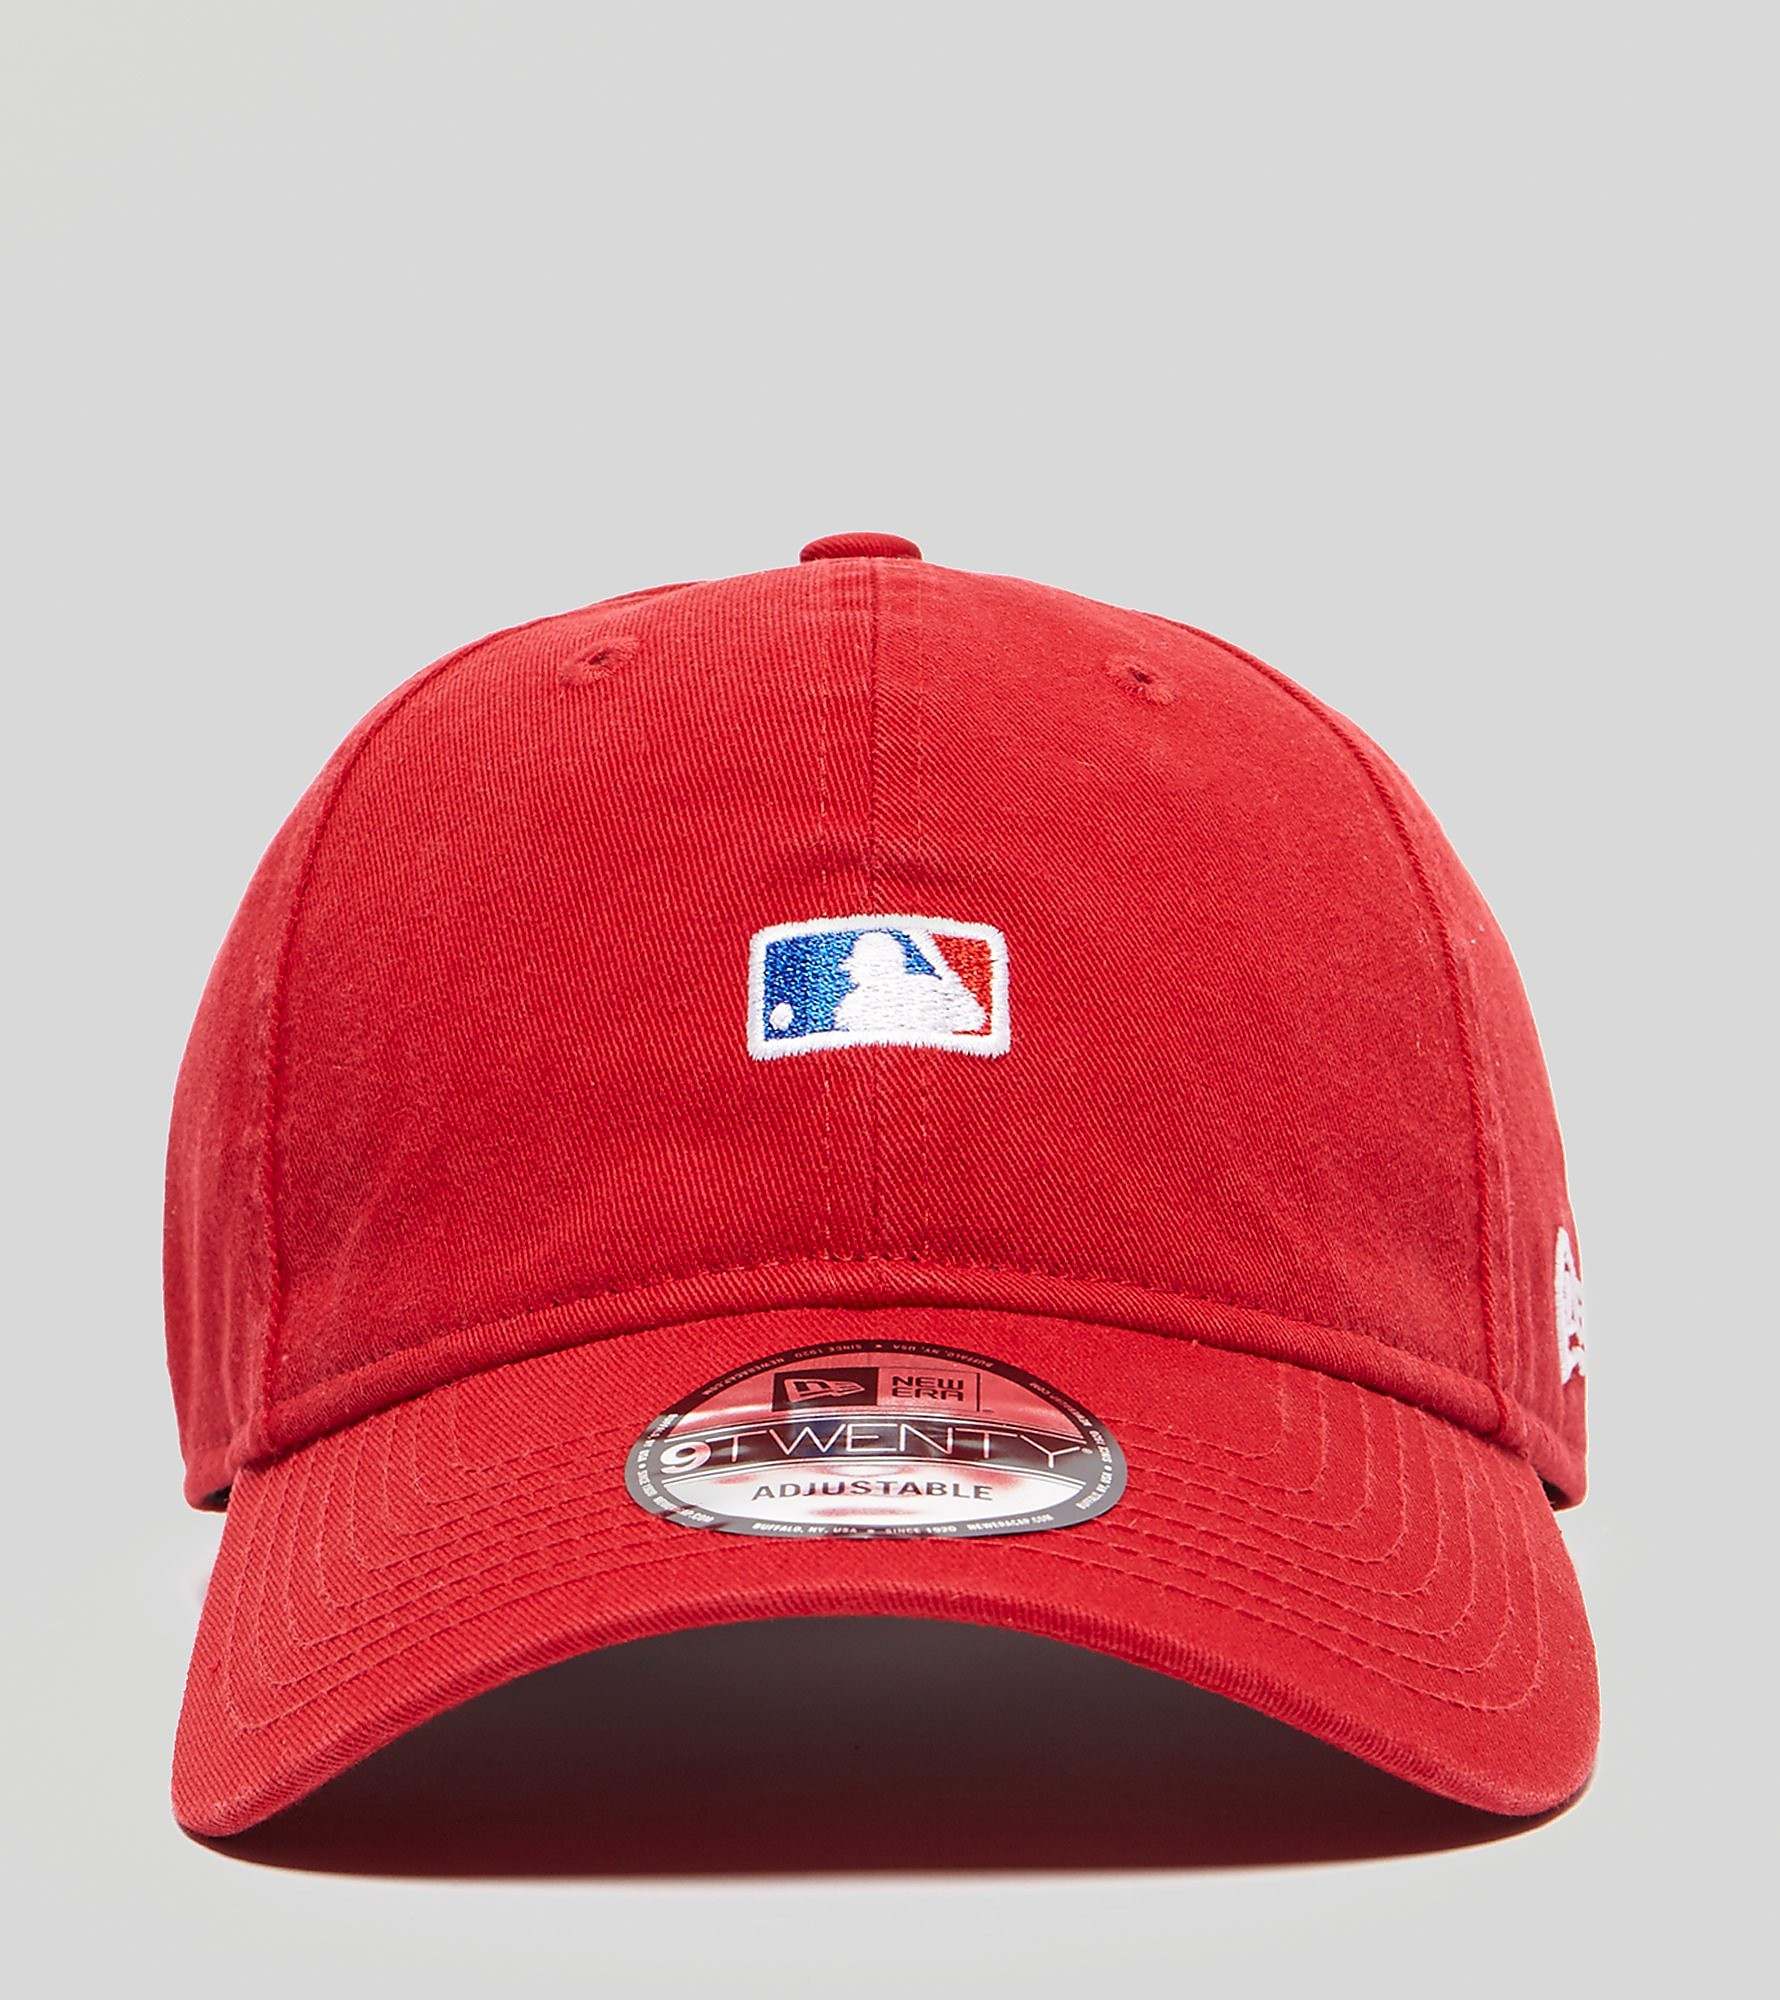 New Era 9TWENTY MBL Cap - size? Exclusive